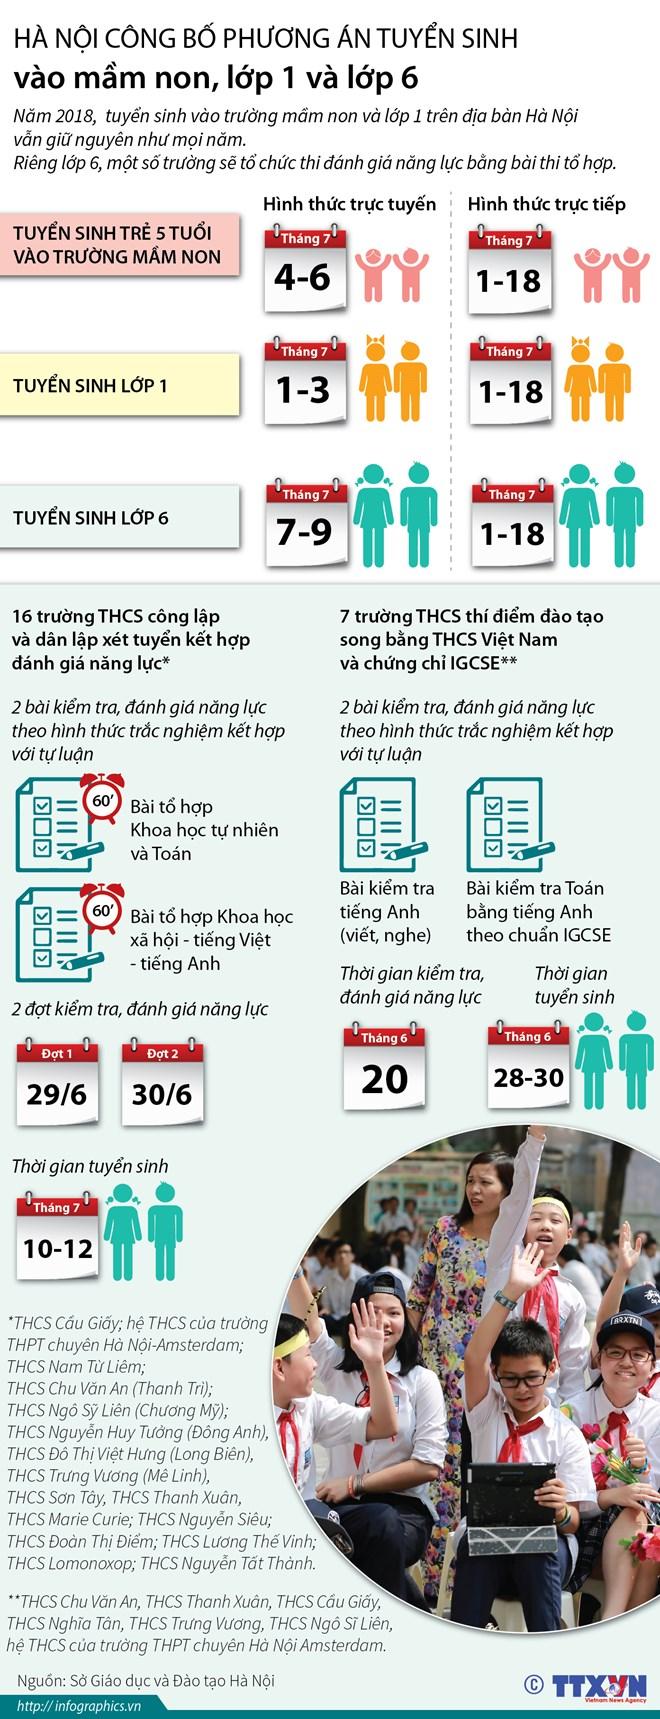 infographics cong bo phuong an tuyen sinh vao lop 1 lop 6